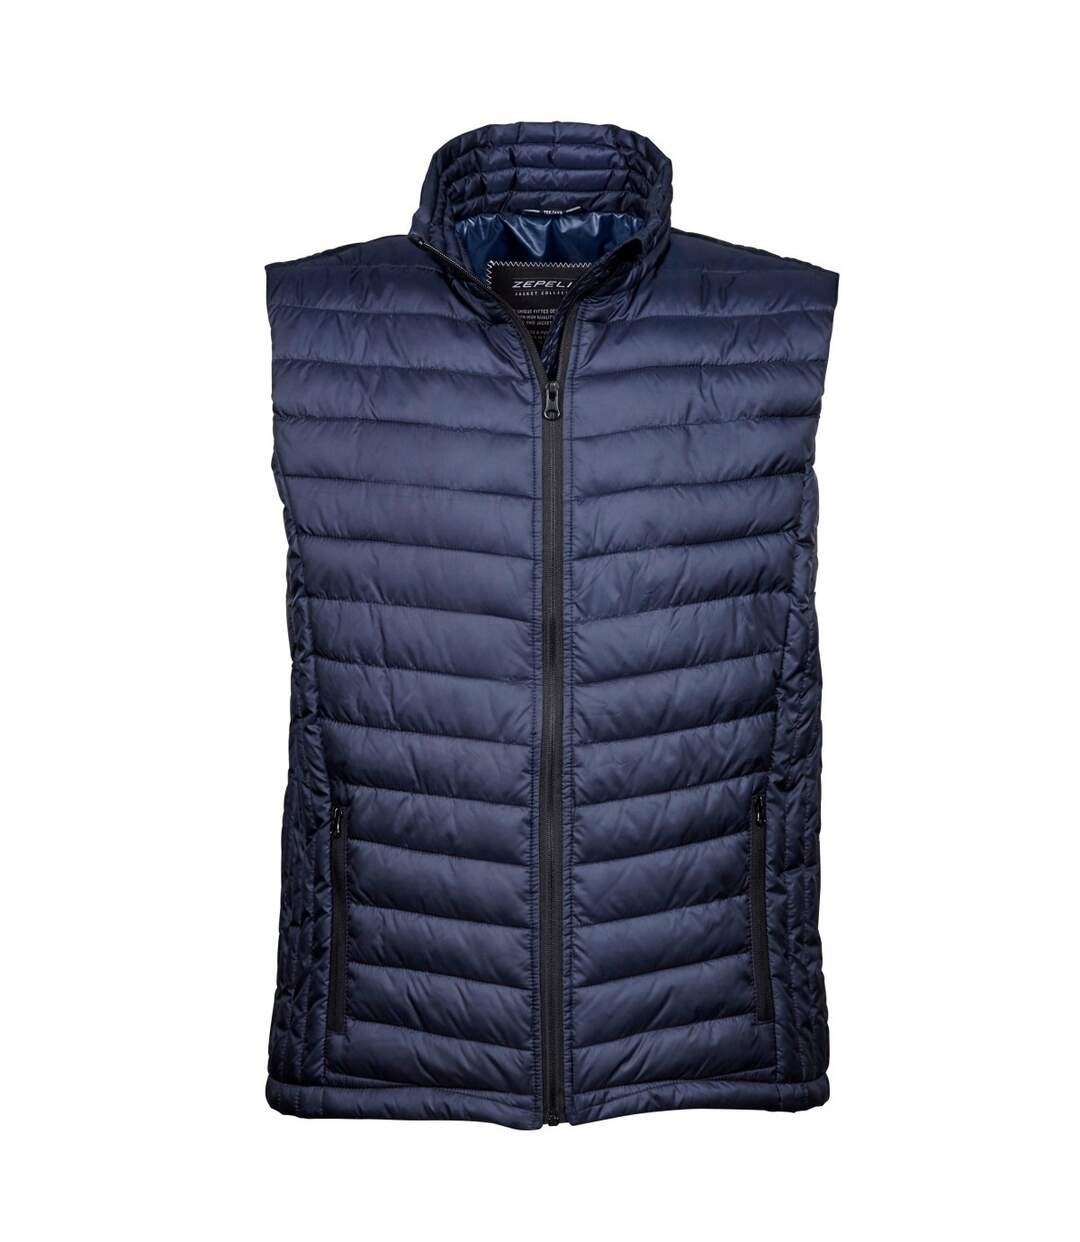 Tee Jays Mens Padded Zepelin Vest Jacket / Gilet (Deep Navy) - UTBC3336